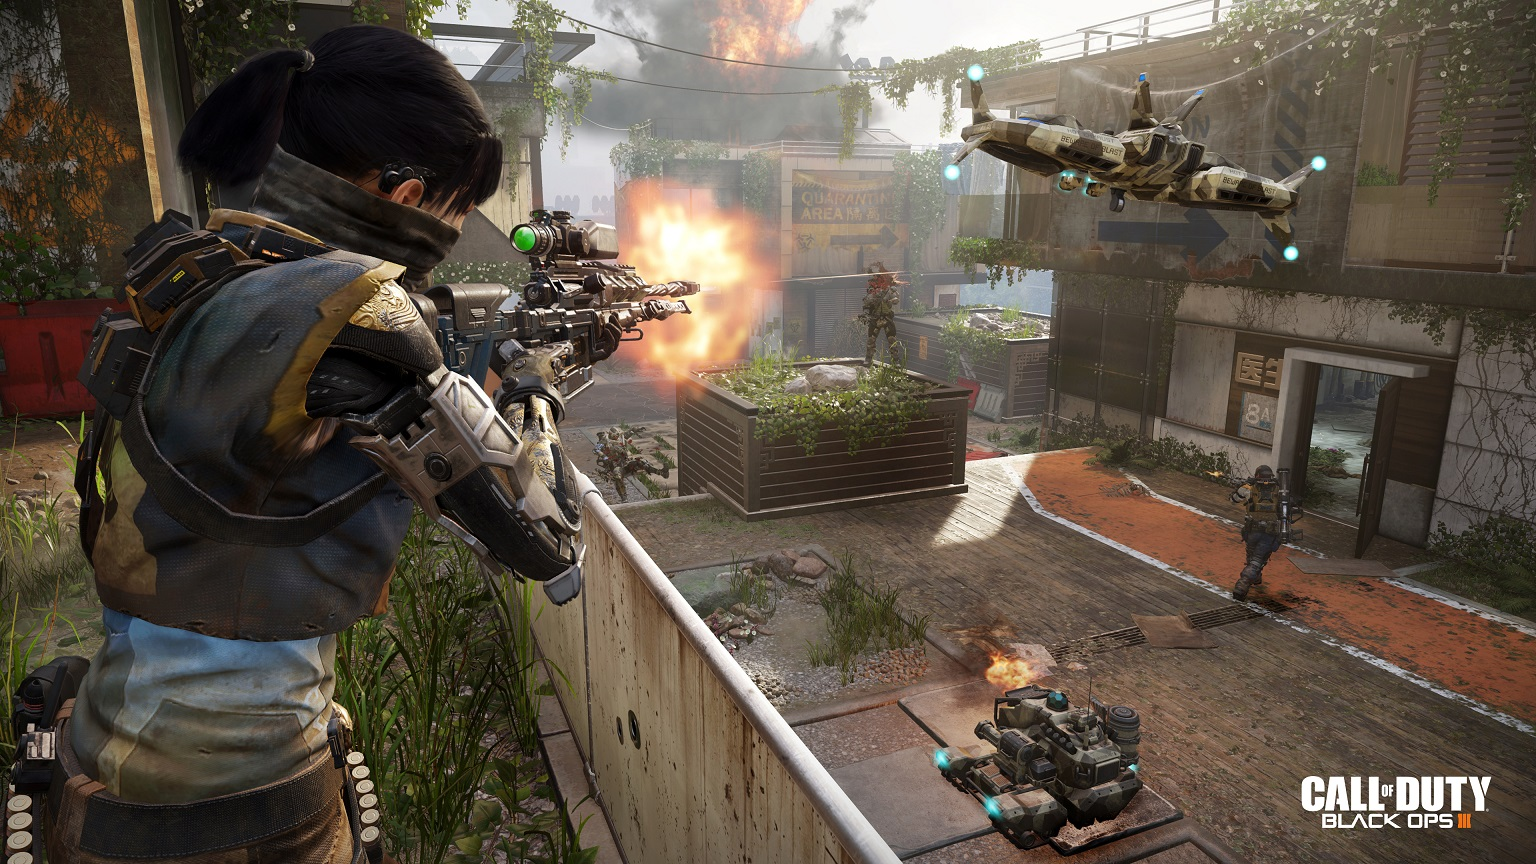 Call Of Duty Black Ops Iii Revelado Para Playstation 3 E Xbox 360